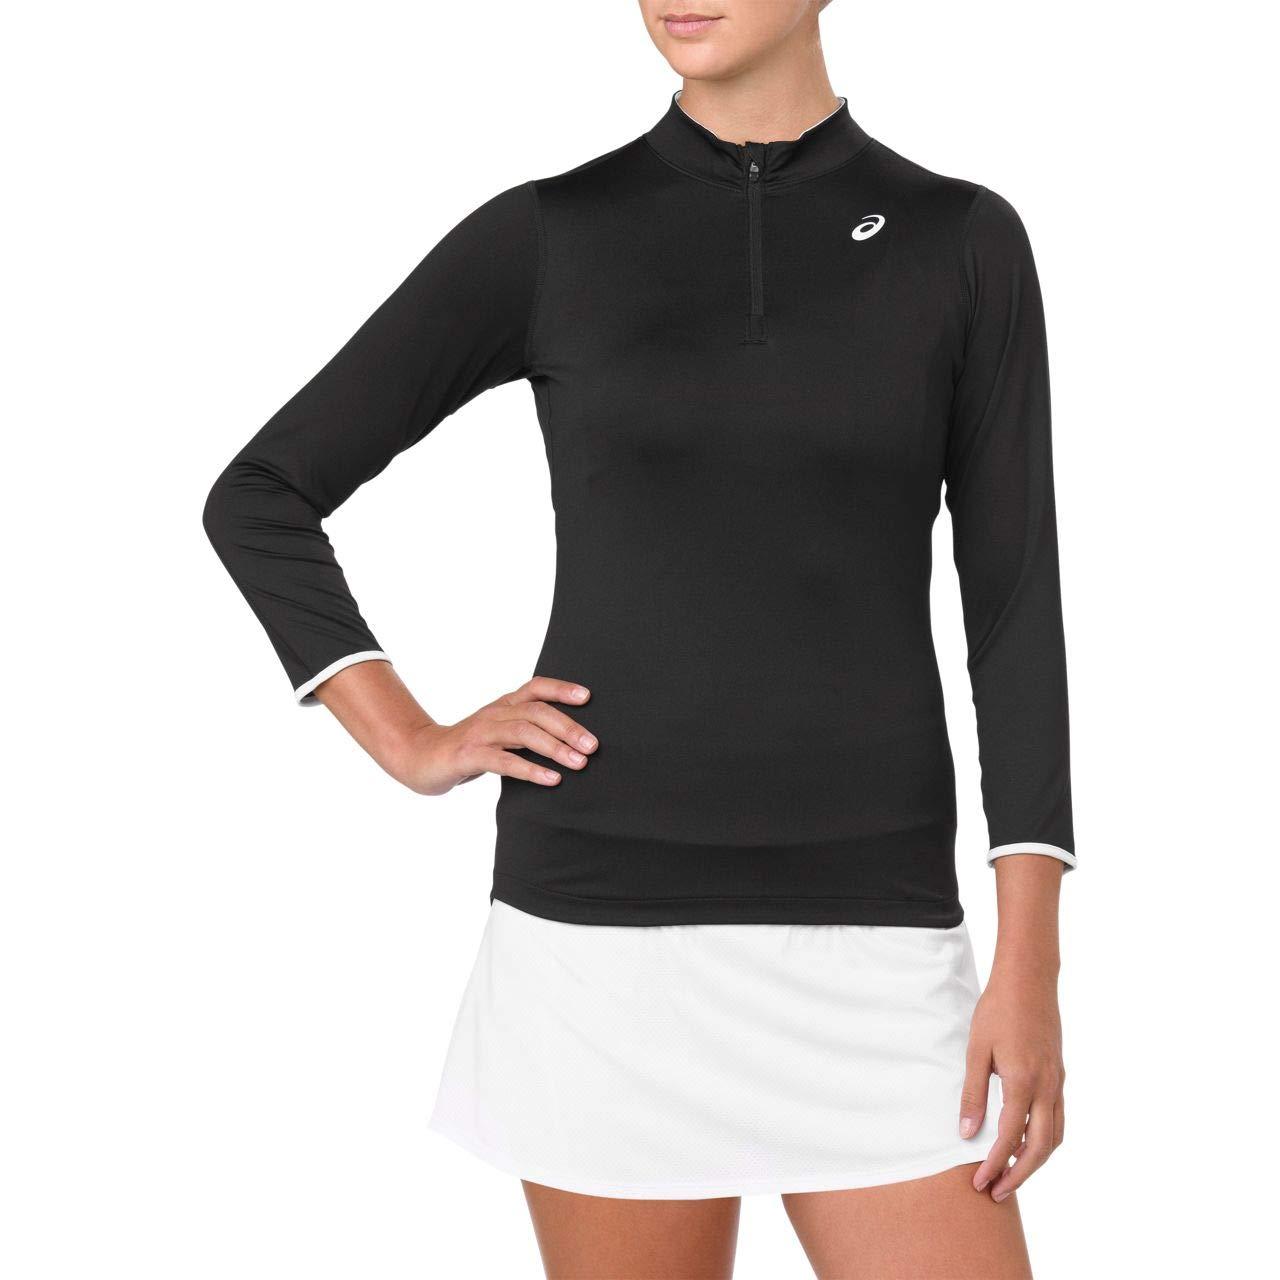 ASICS Women's Elite 3/4 Sleeve, Performance Black - Large